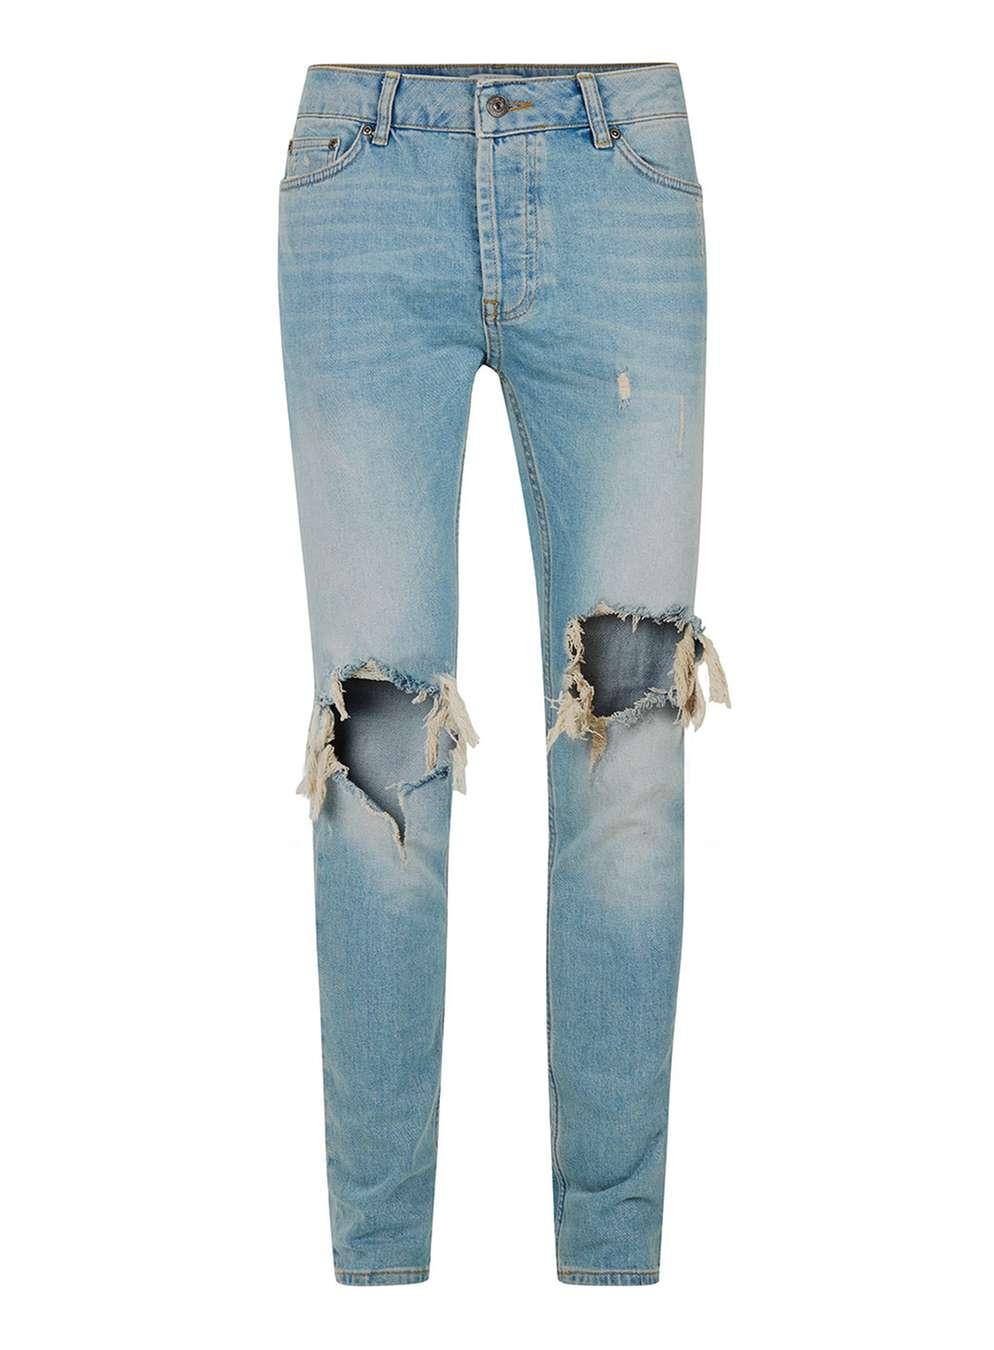 Topman ripped jeans